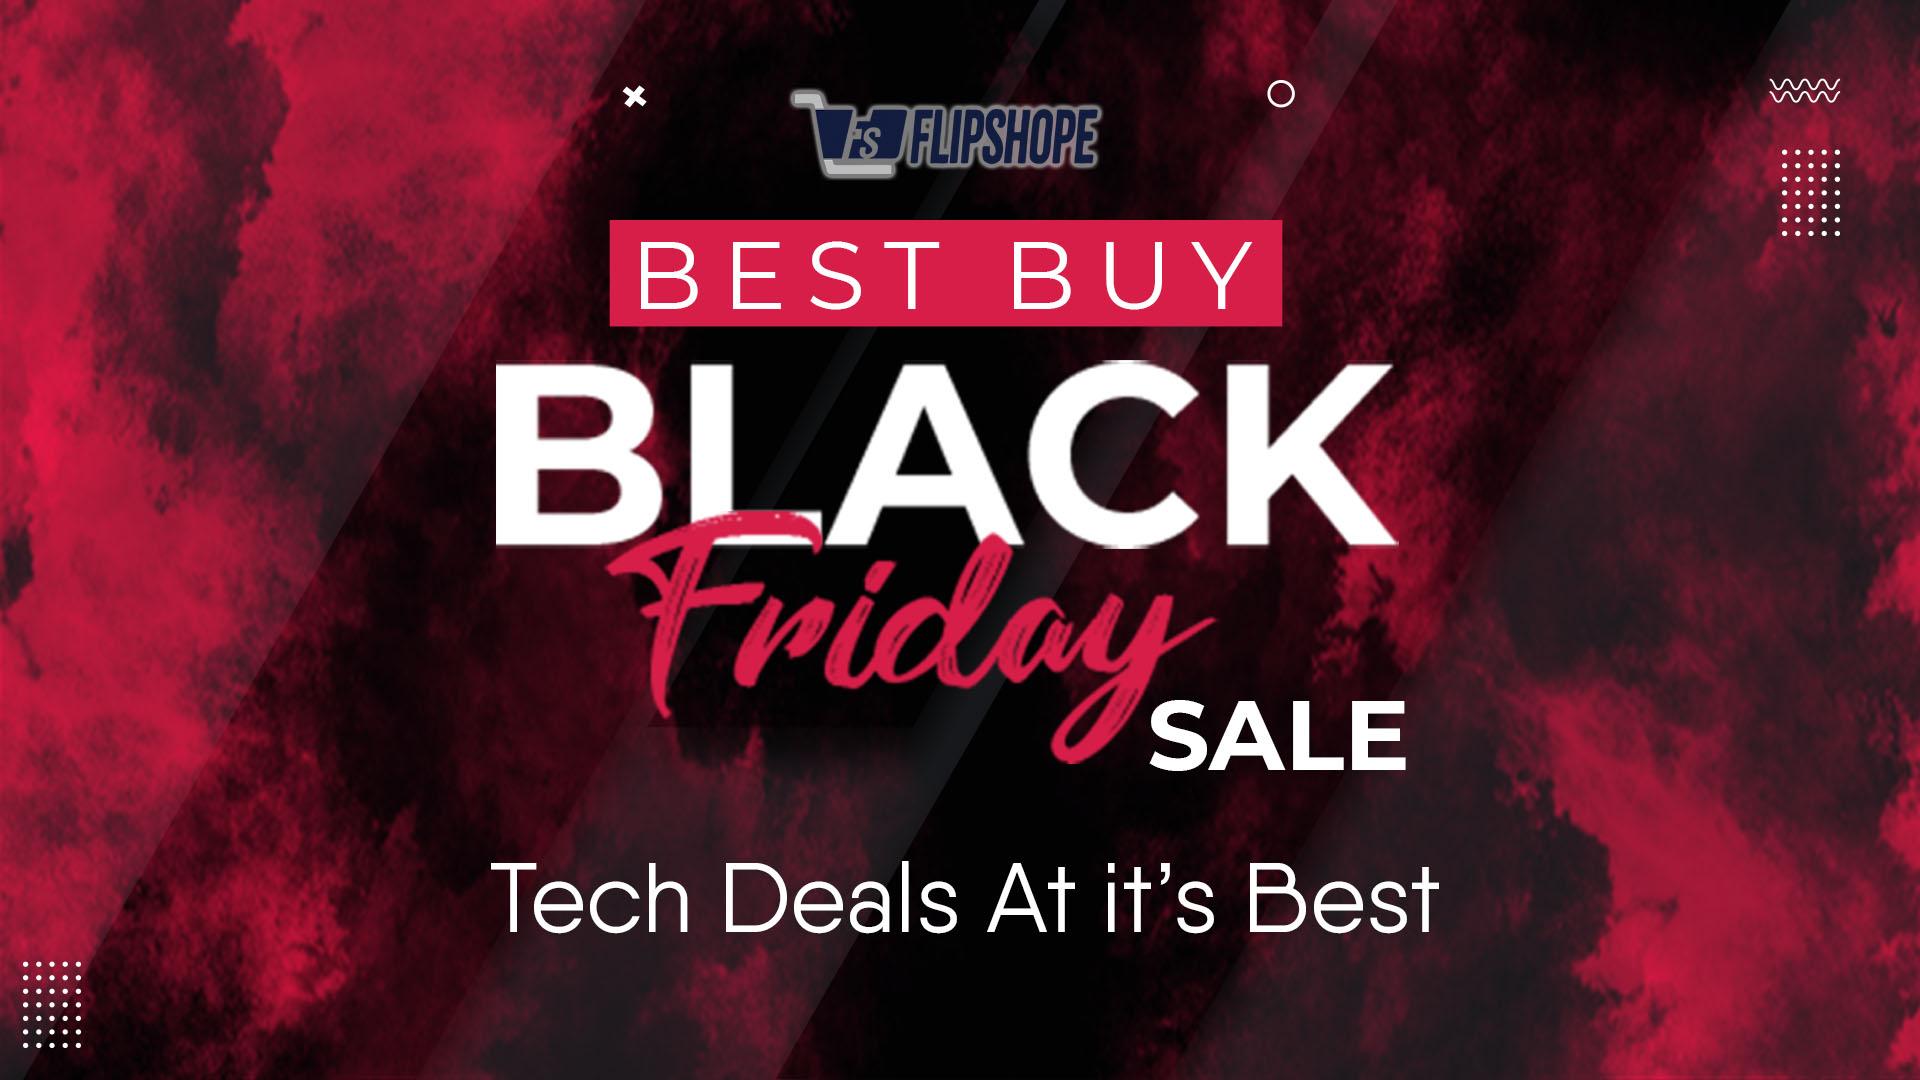 Best Buy Black Friday Sale